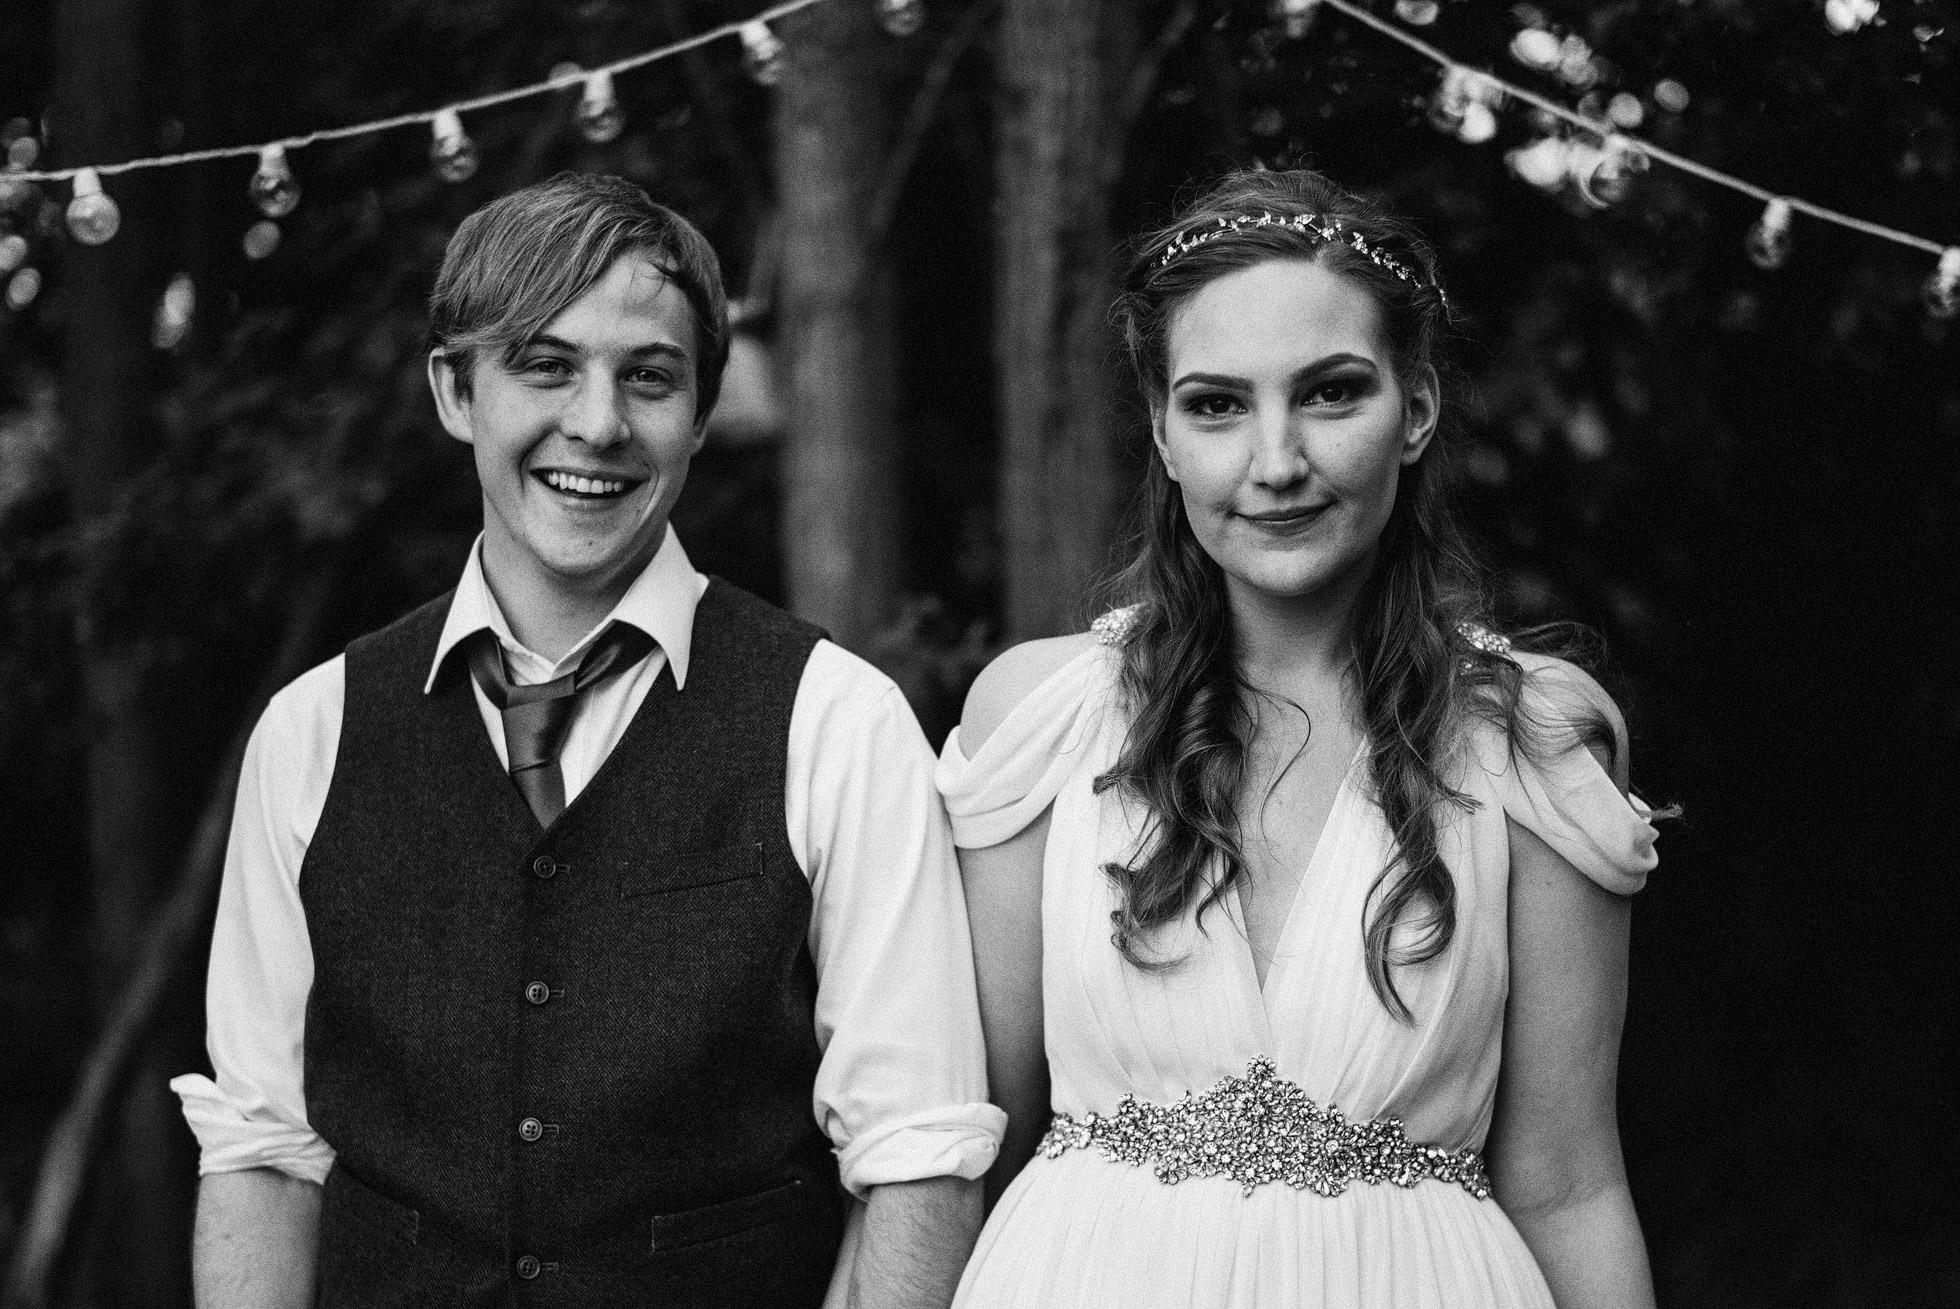 Wedding Portraits at Skipbridge